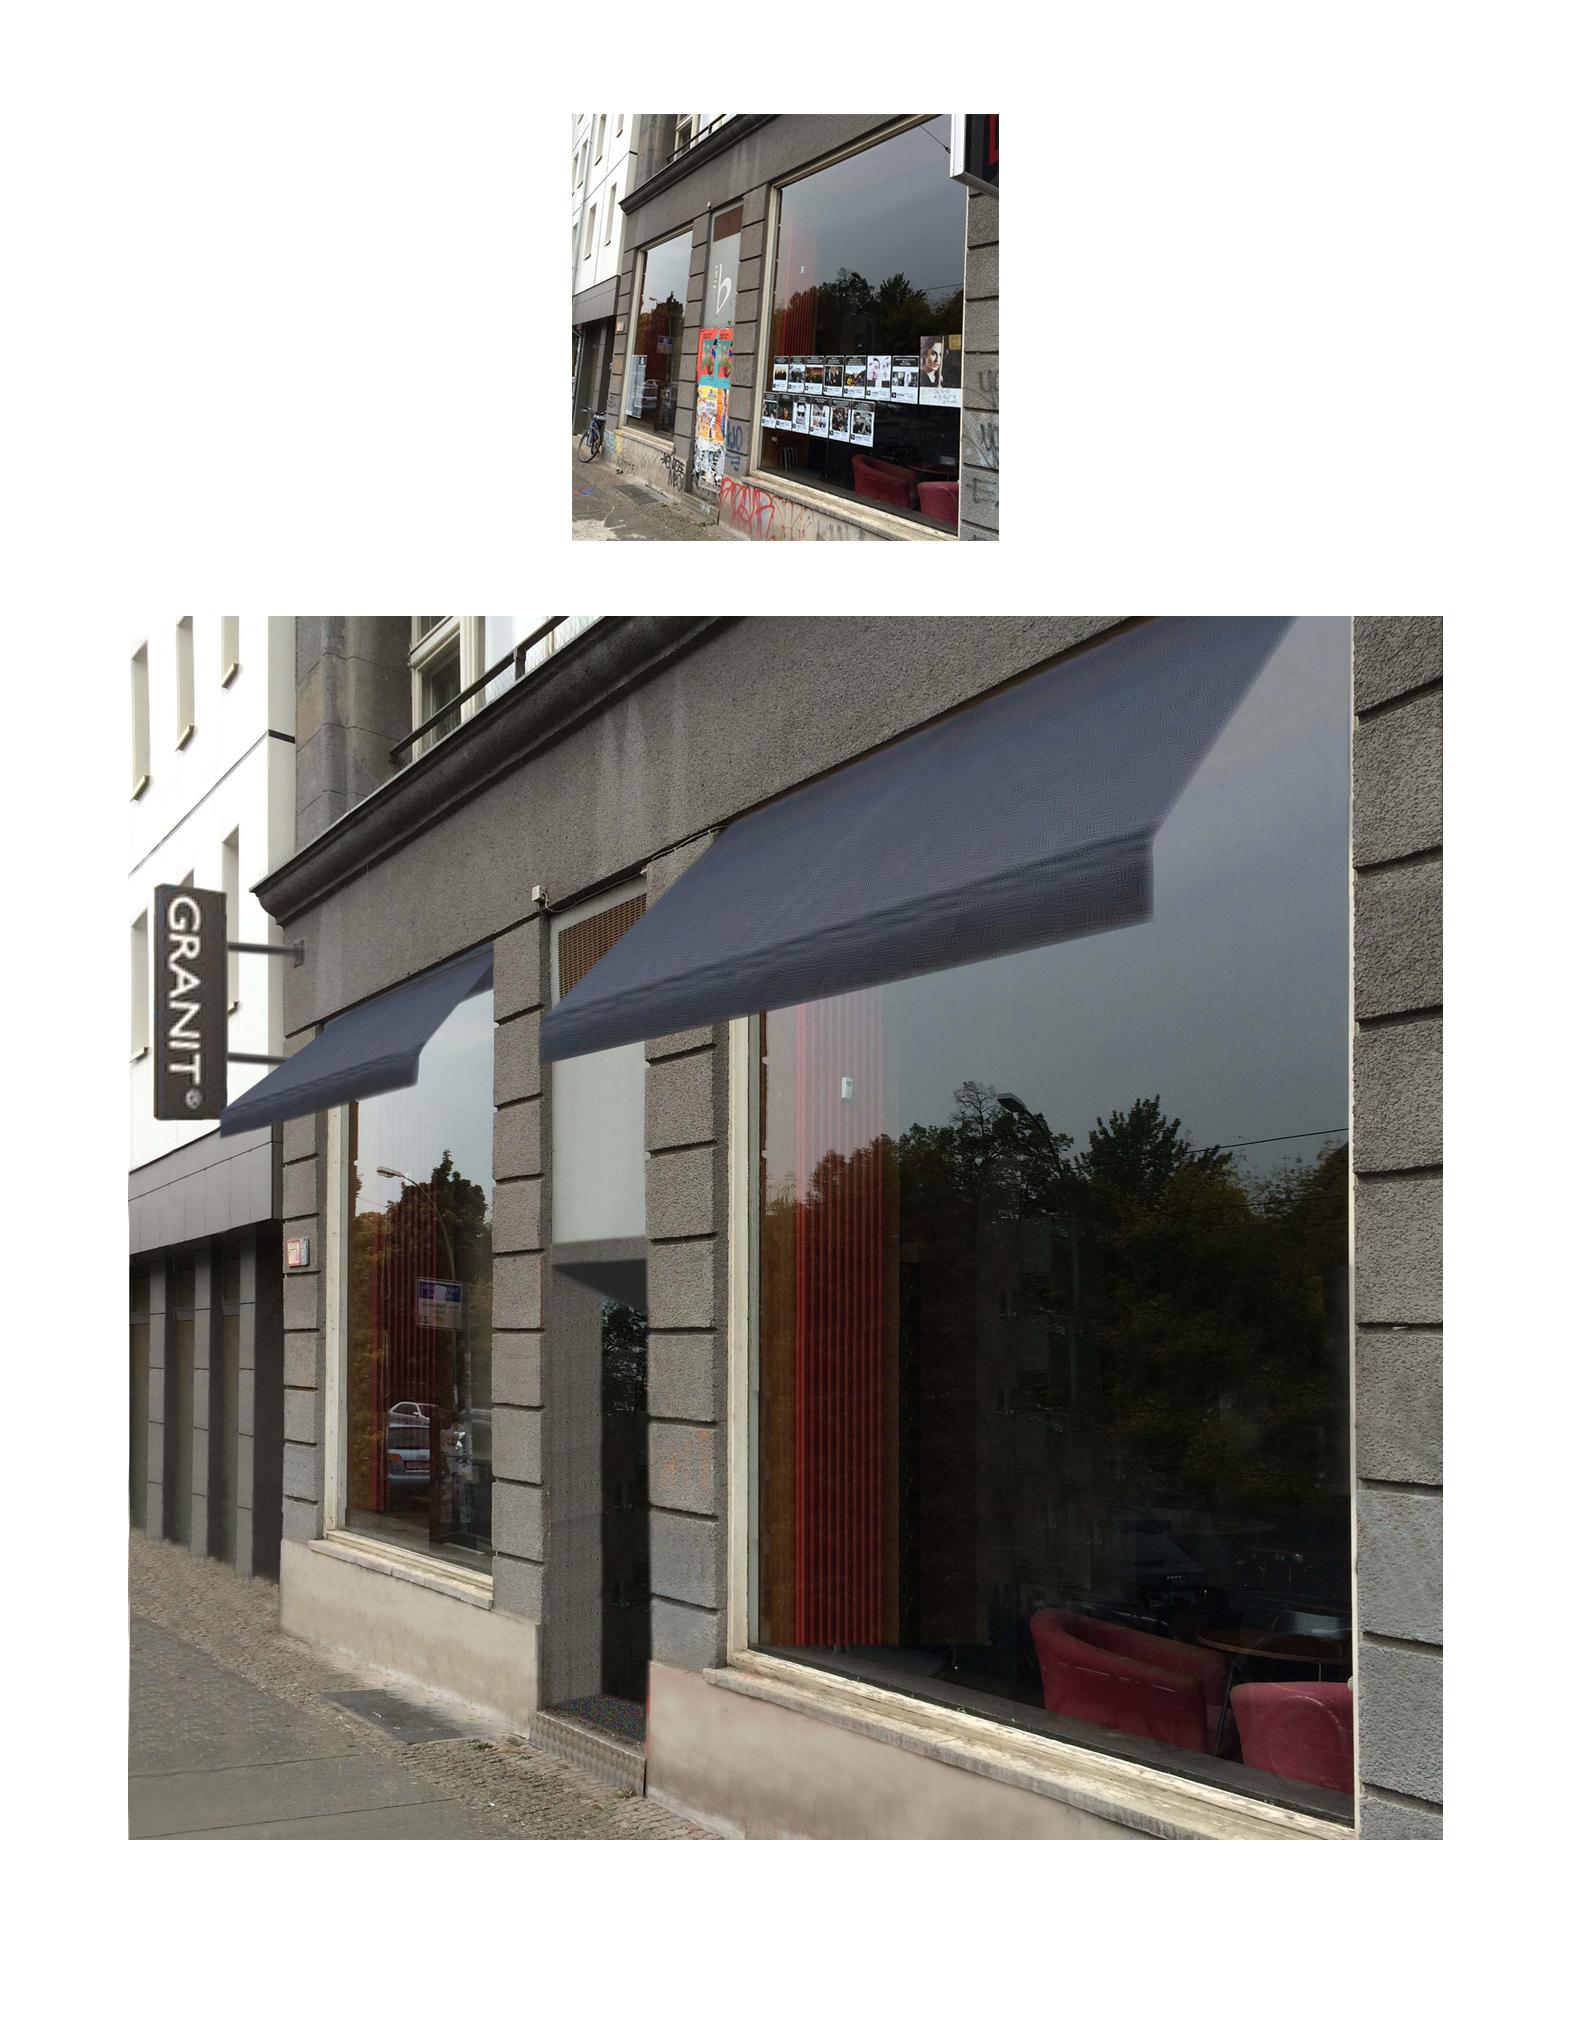 Photoshopjobb, Granit i Berlin för MGazzo Arkitektur